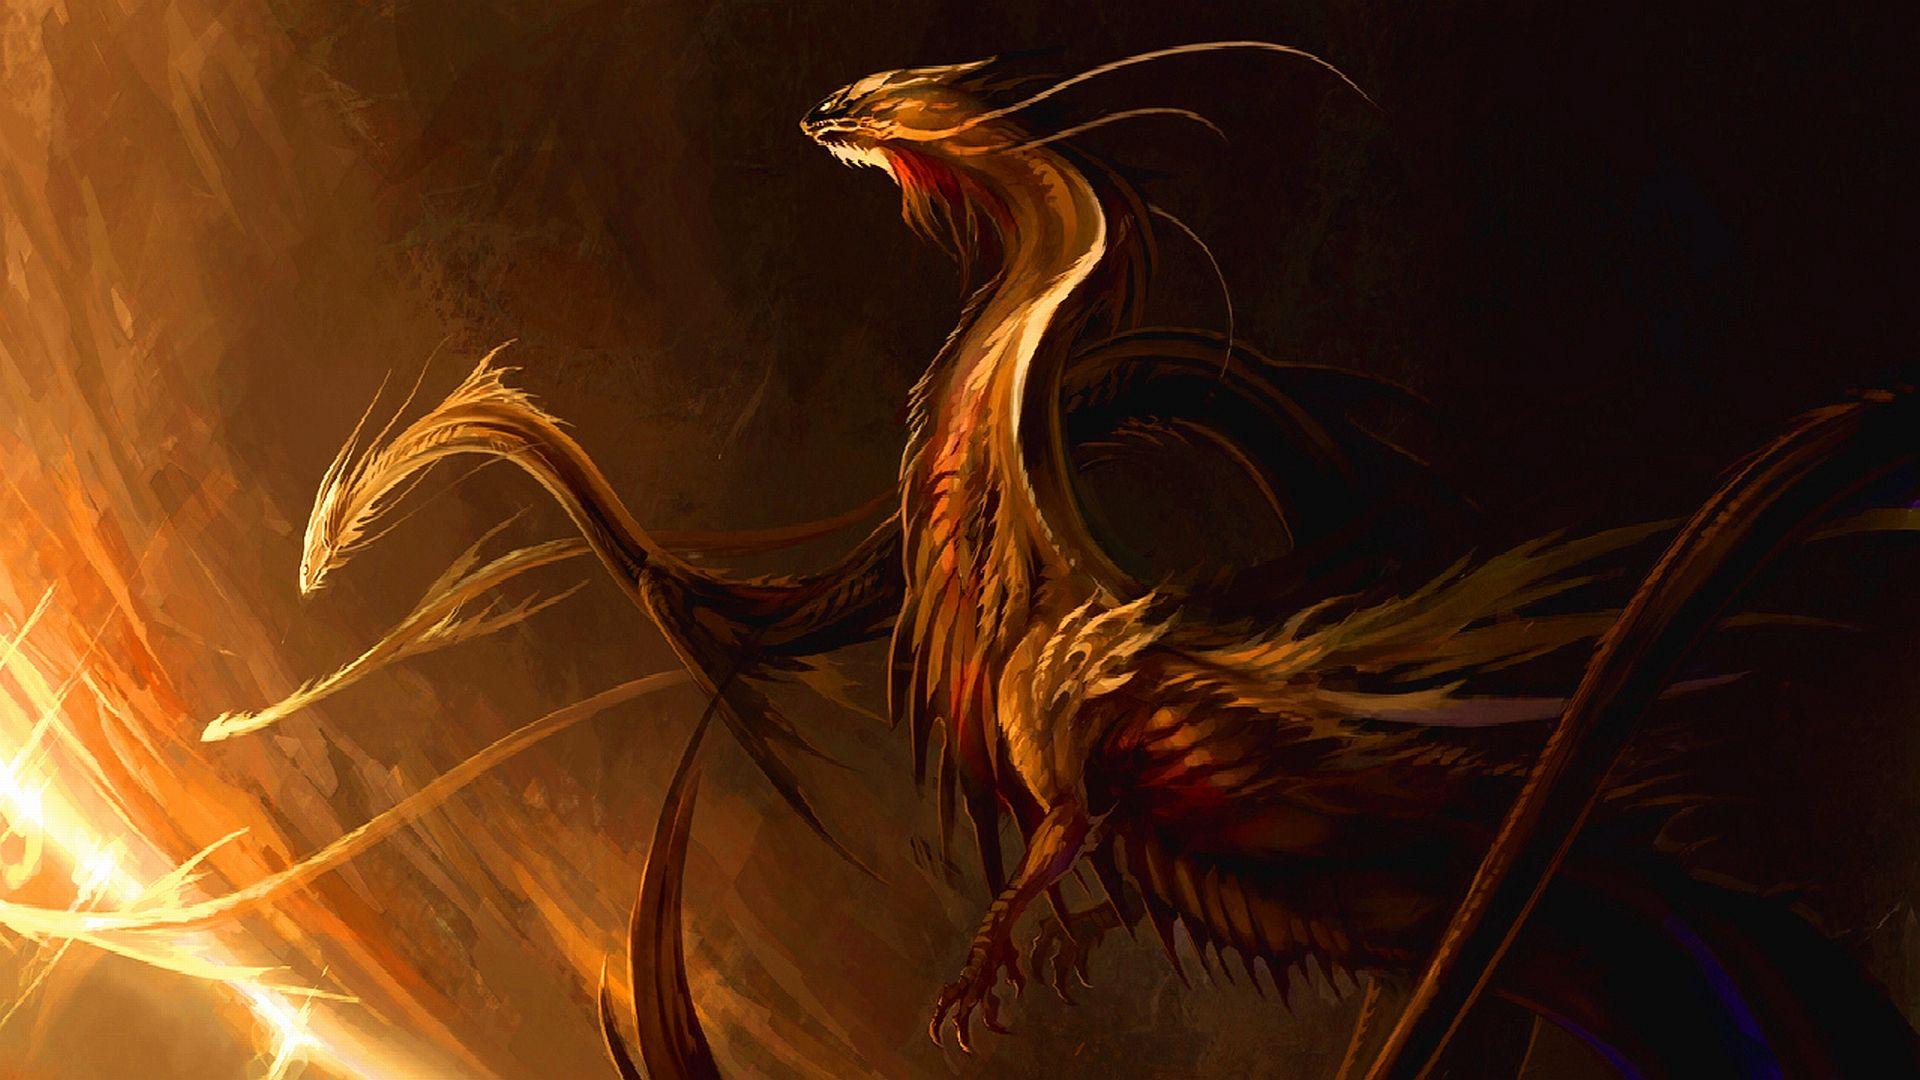 Beautiful Imagine Dragons Wallpaper X Free Wallpaper Hd Rhspayceme